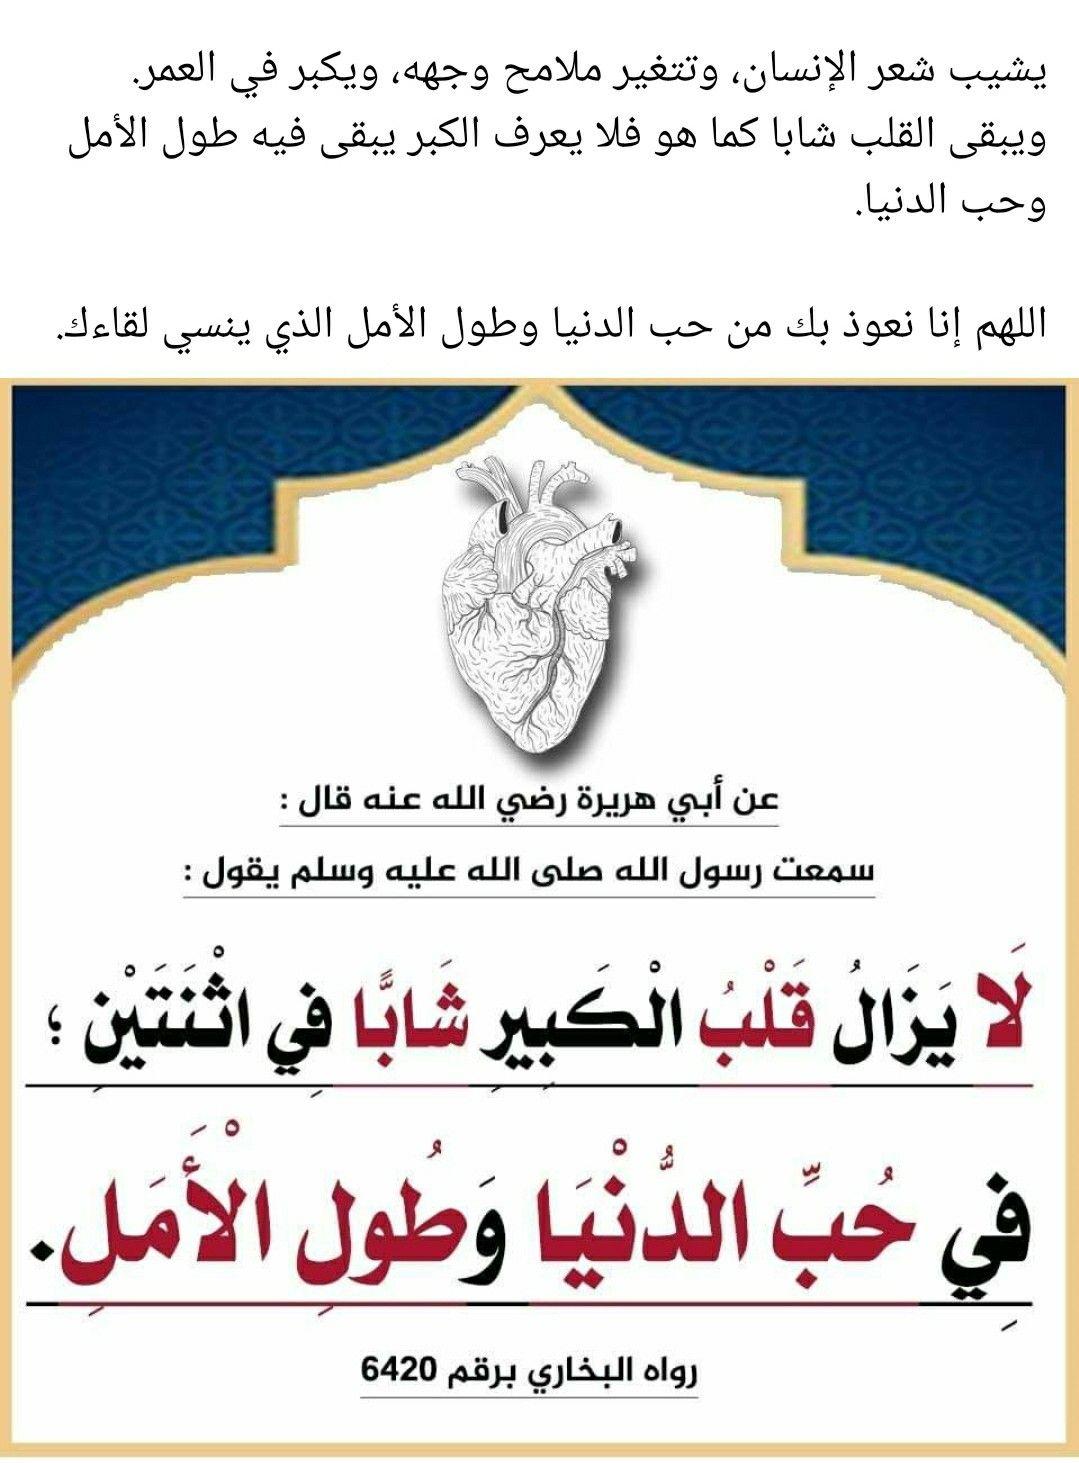 Pin By The Noble Quran On I Love Allah Quran Islam The Prophet Miracles Hadith Heaven Prophets Faith Prayer Dua حكم وعبر احاديث الله اسلام قرآن دعاء Hadith Islam Stories